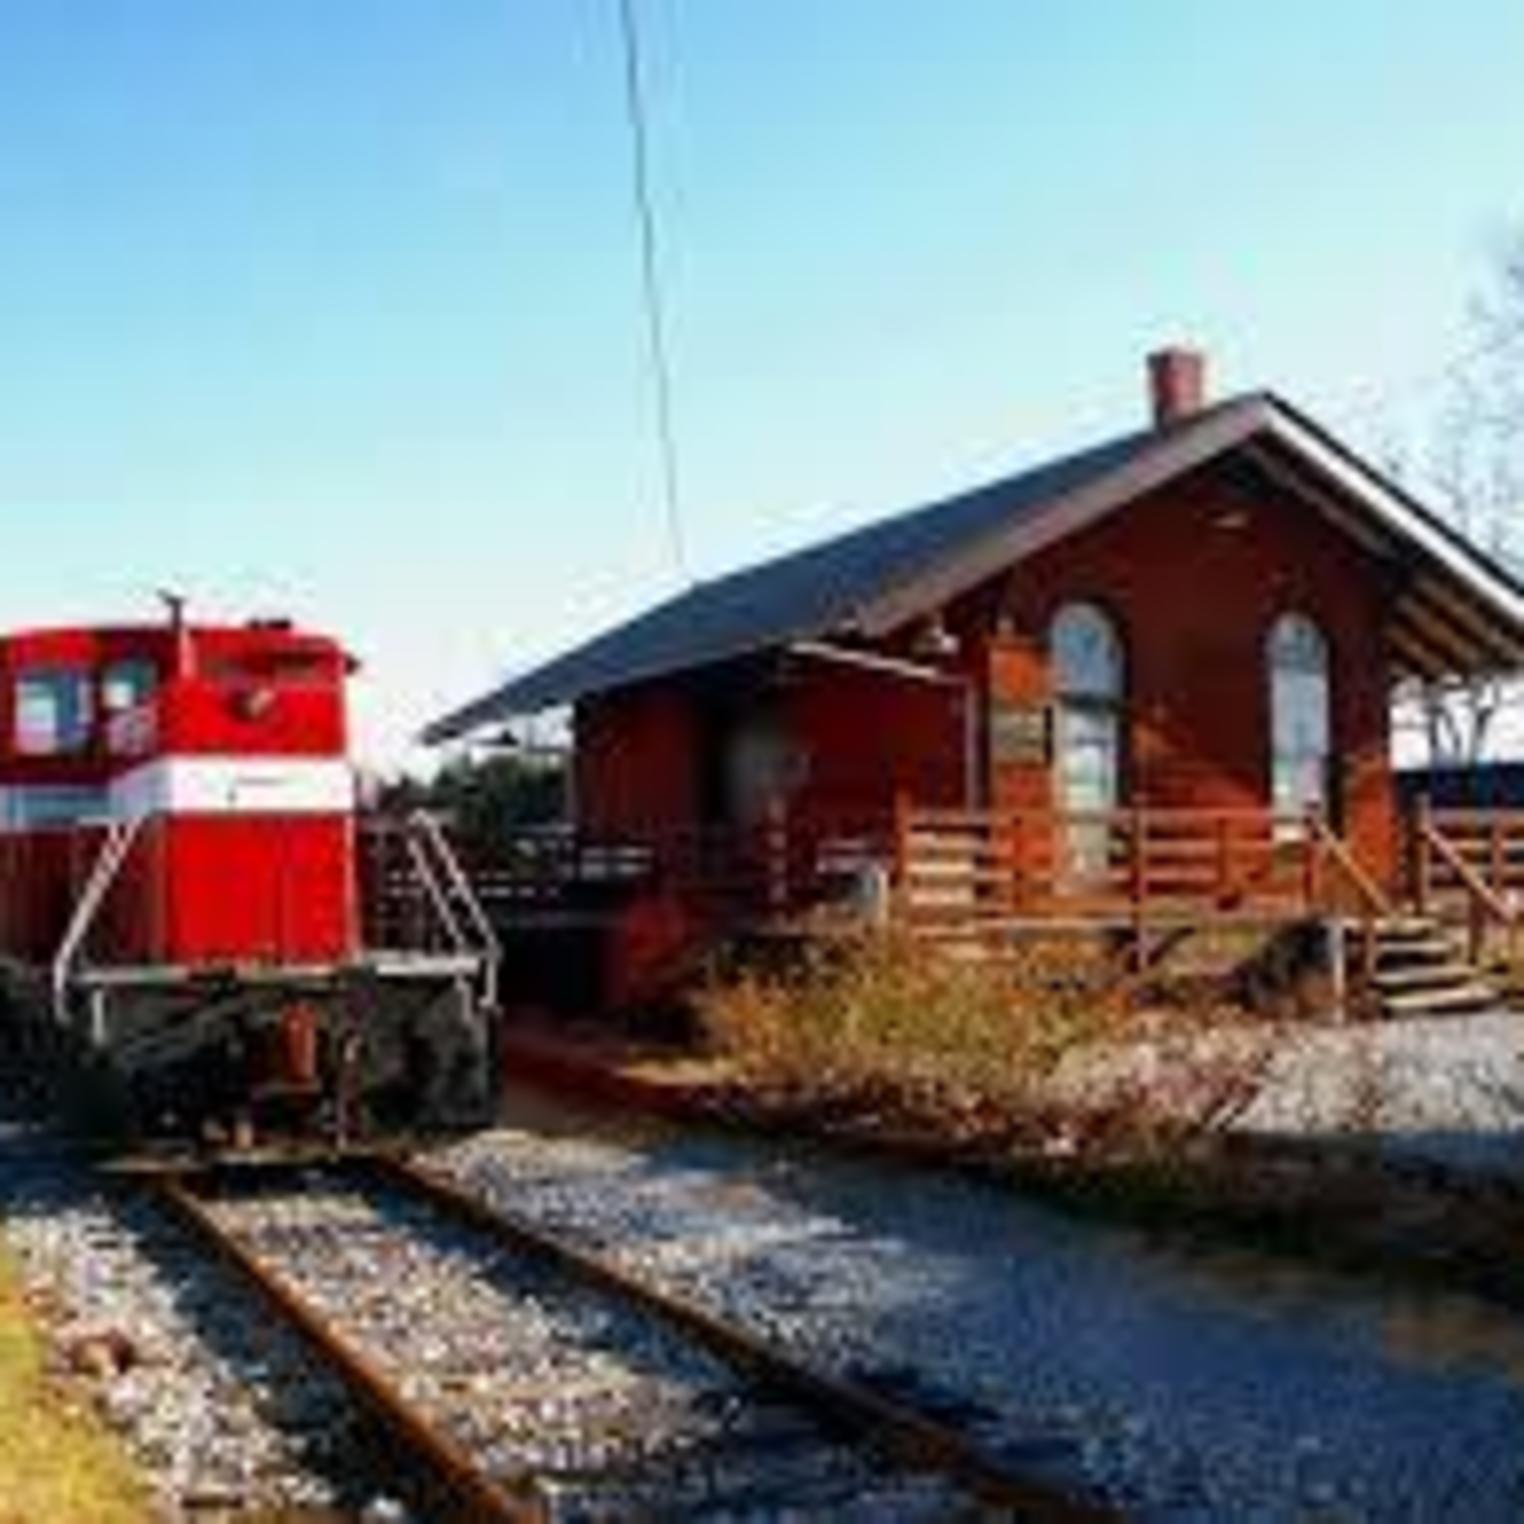 Middletown & Hummelstown Railroad